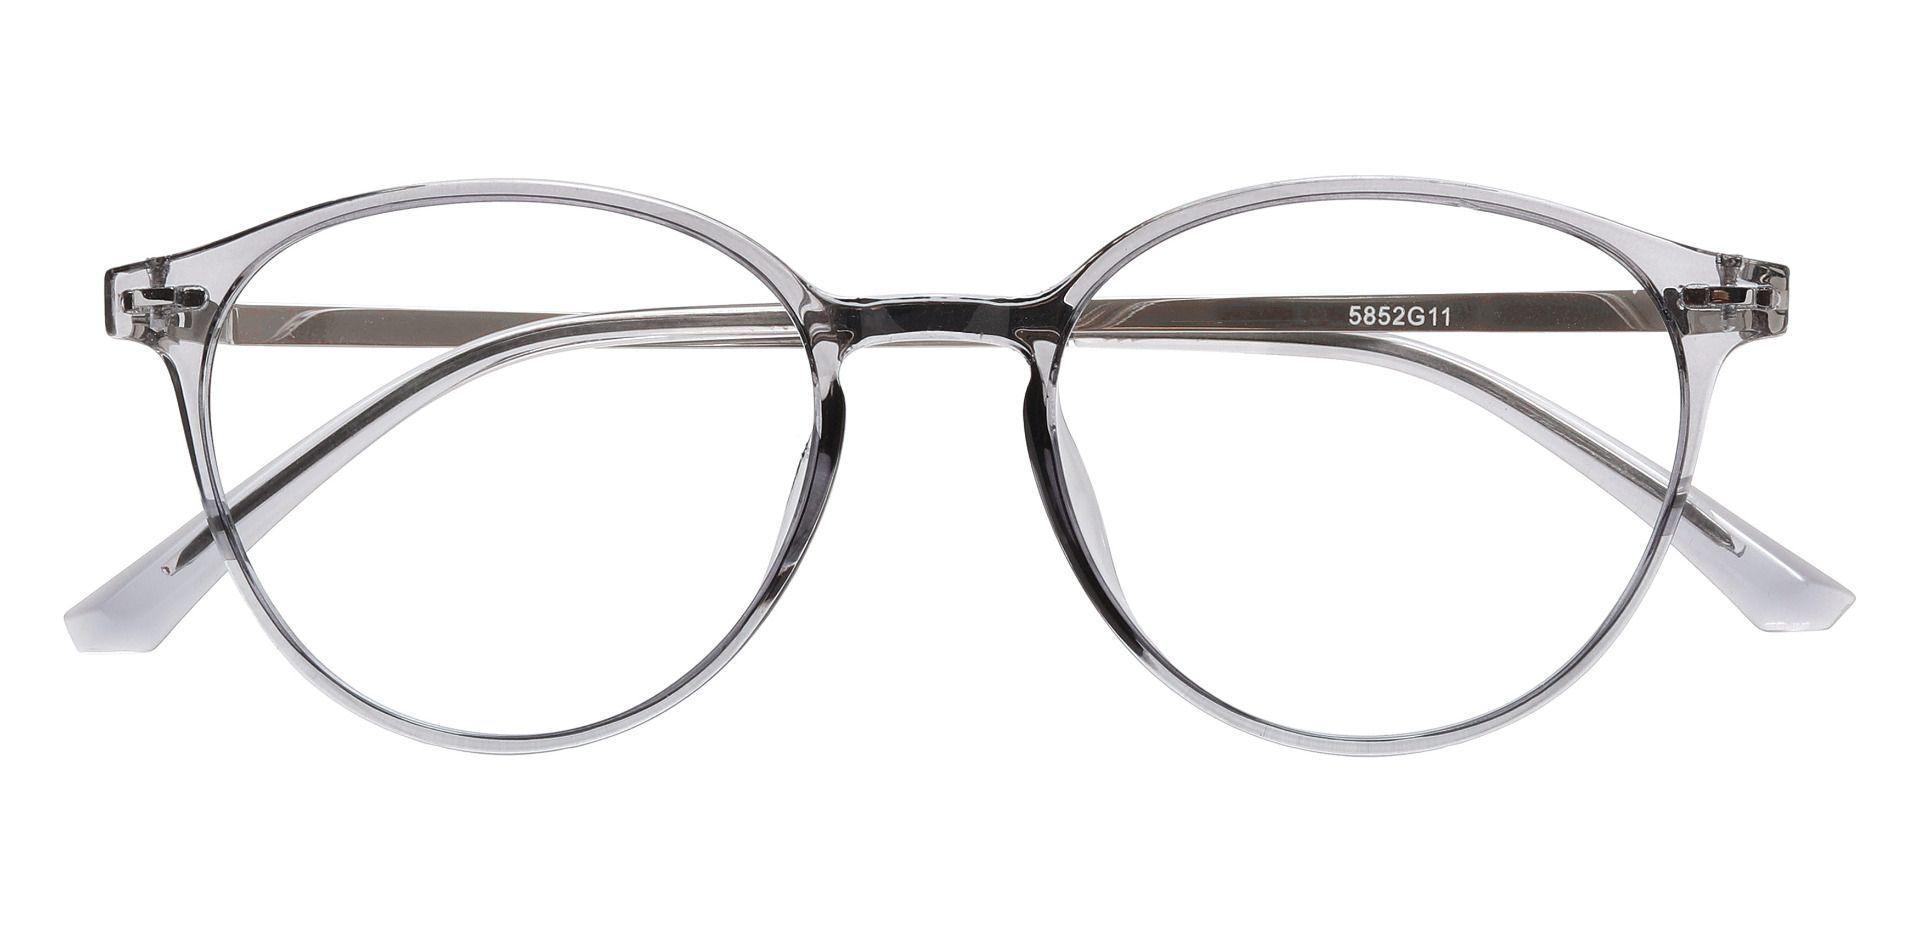 Springer Round Prescription Glasses - Gray